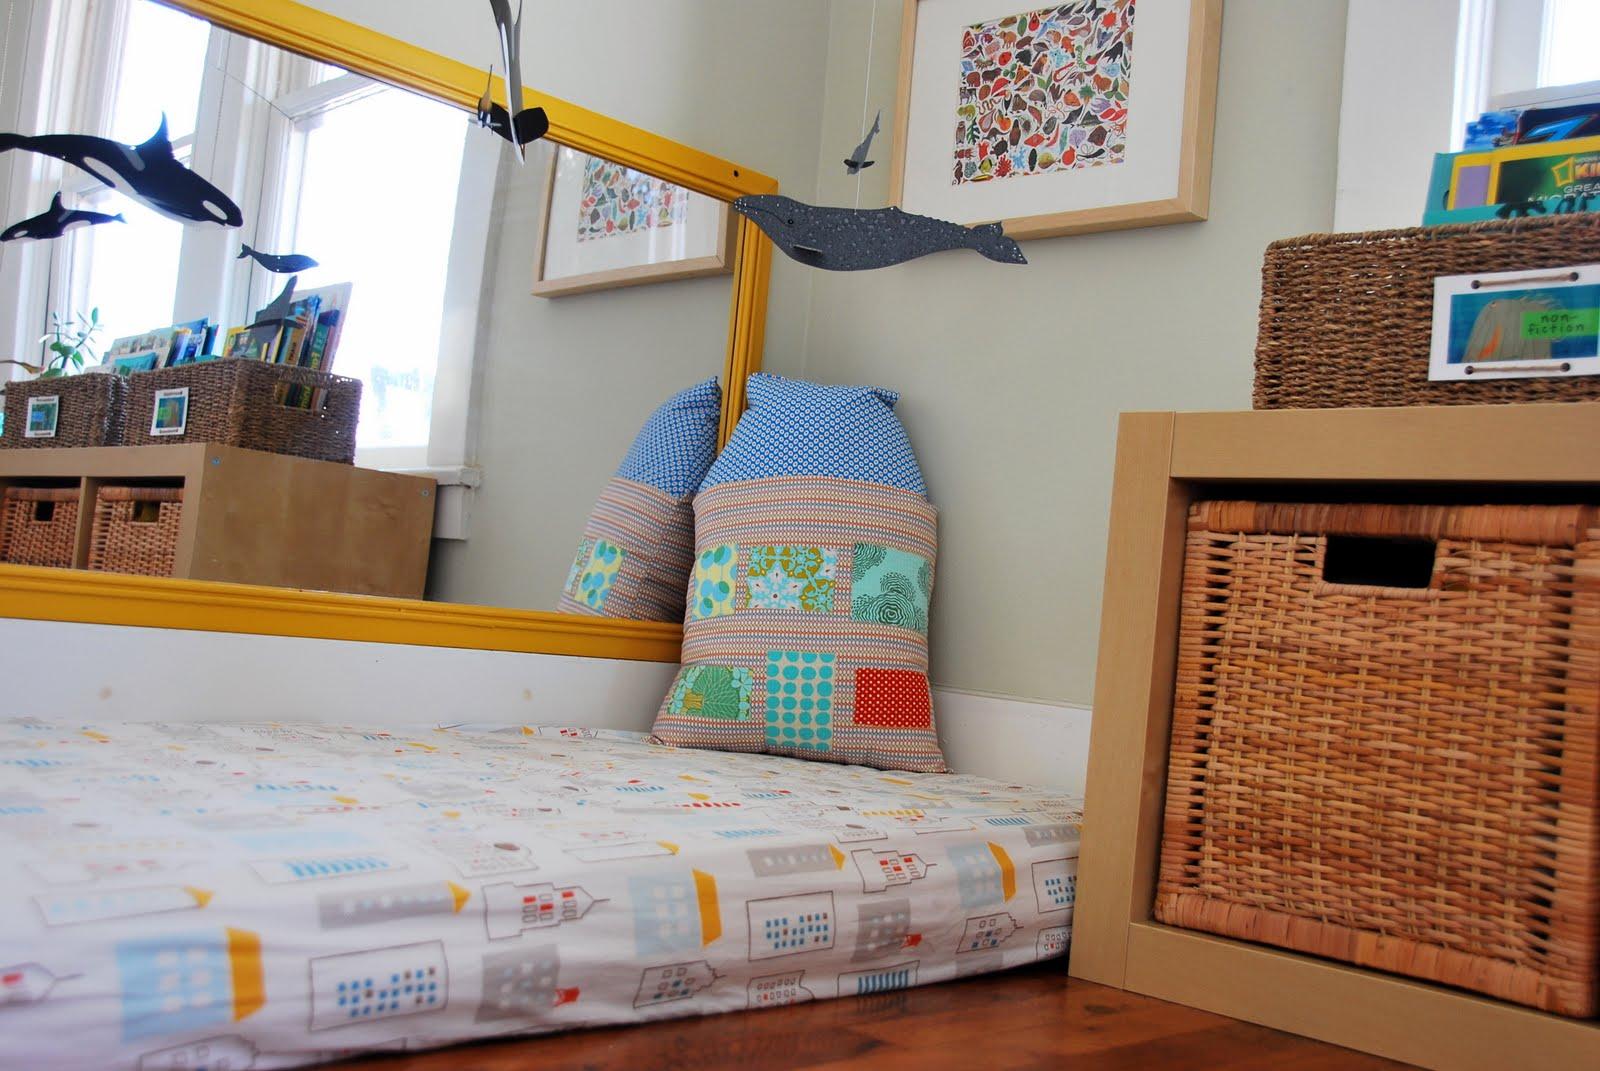 cosy montessori style floor beds. Black Bedroom Furniture Sets. Home Design Ideas